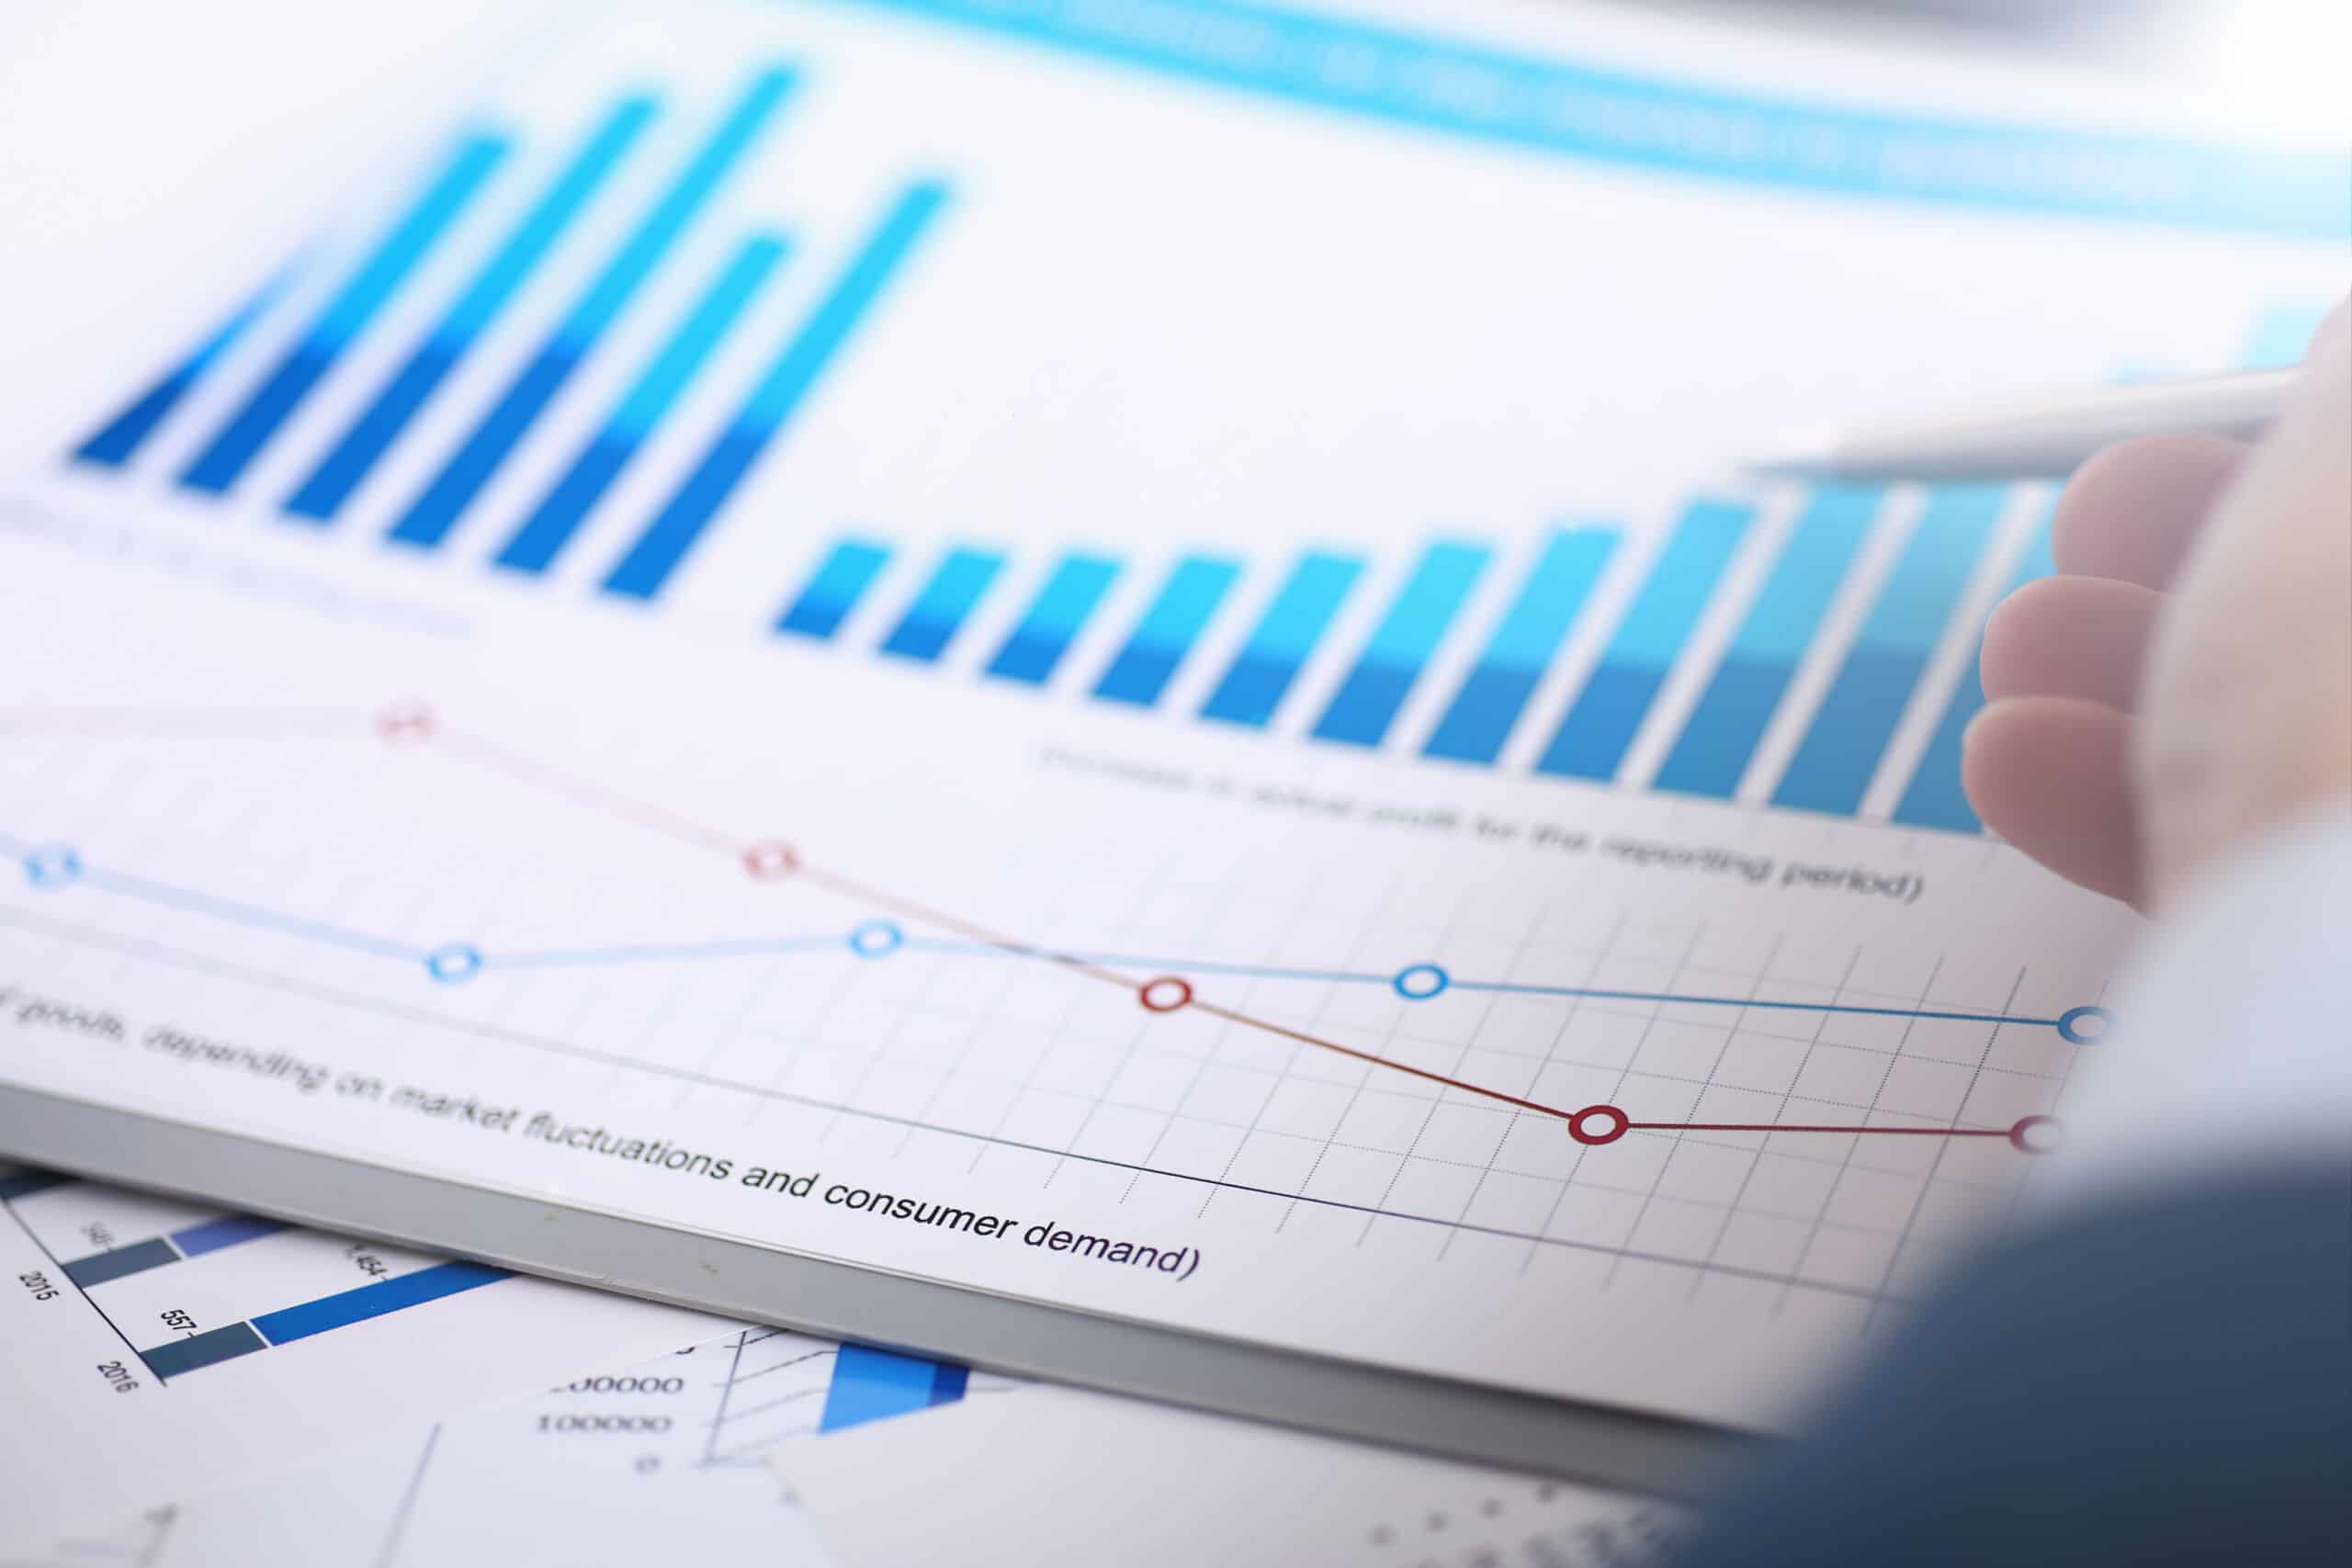 10% Savings Guarantee on your finance function